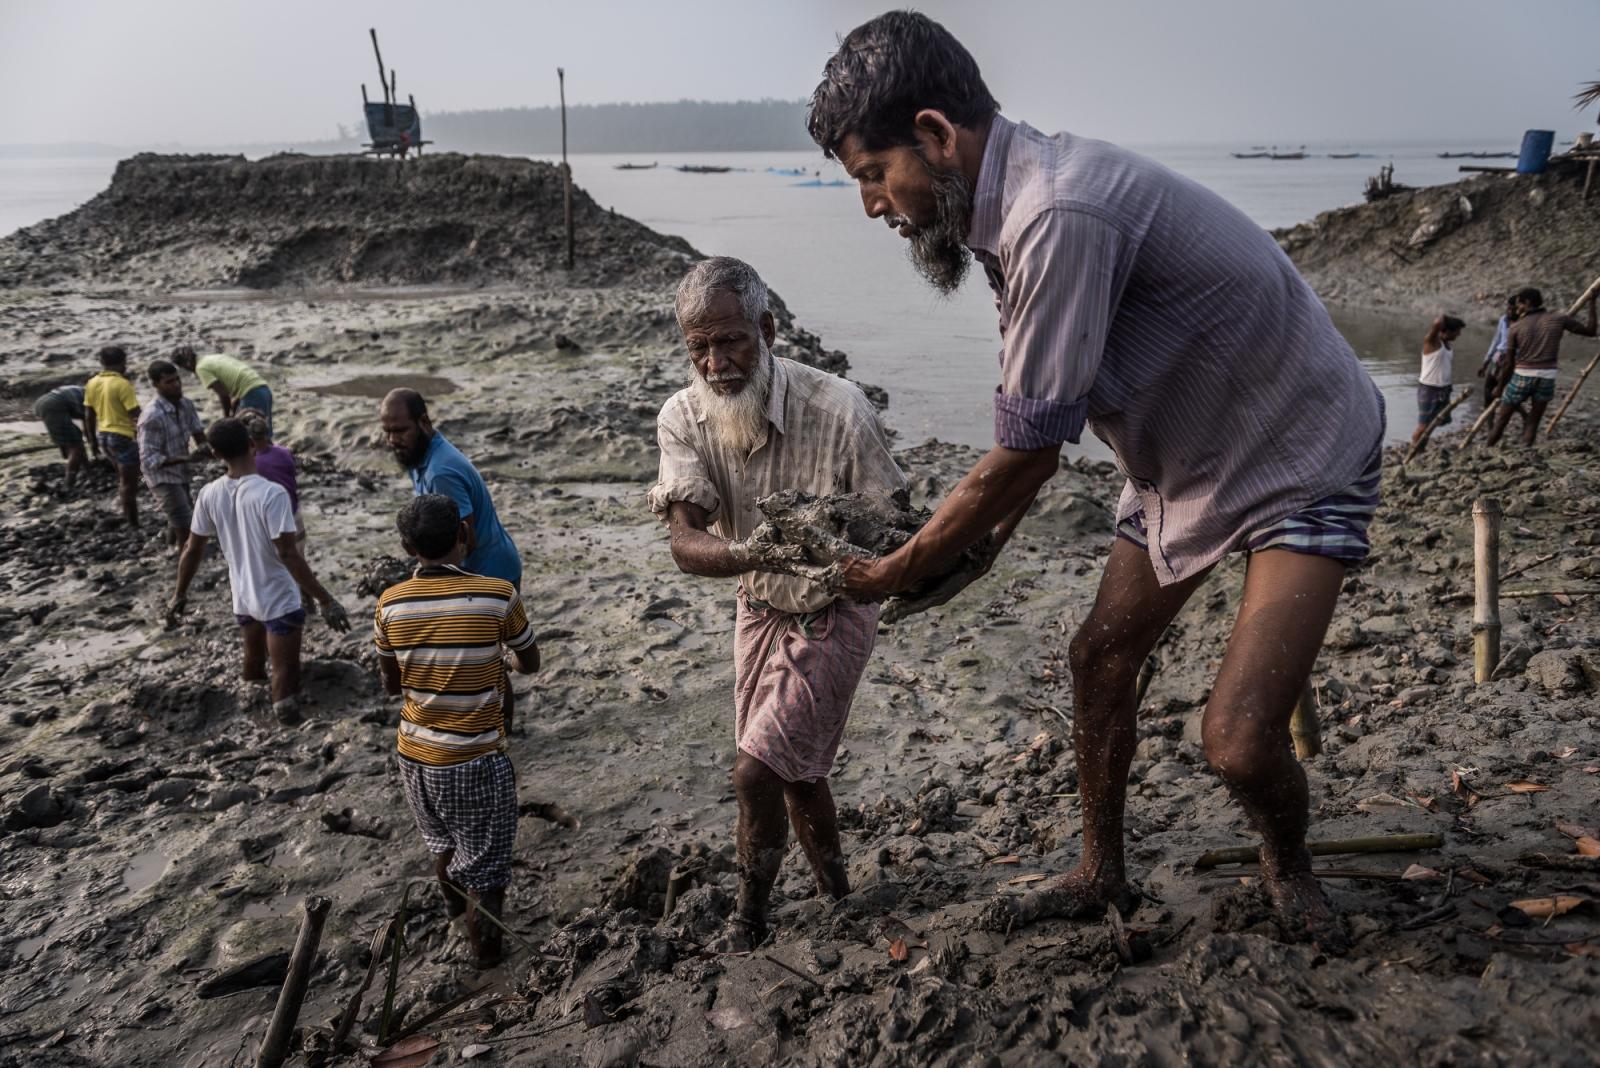 Art and Documentary Photography - Loading Climate_changed_-_Ignacio_Marin-9.jpg